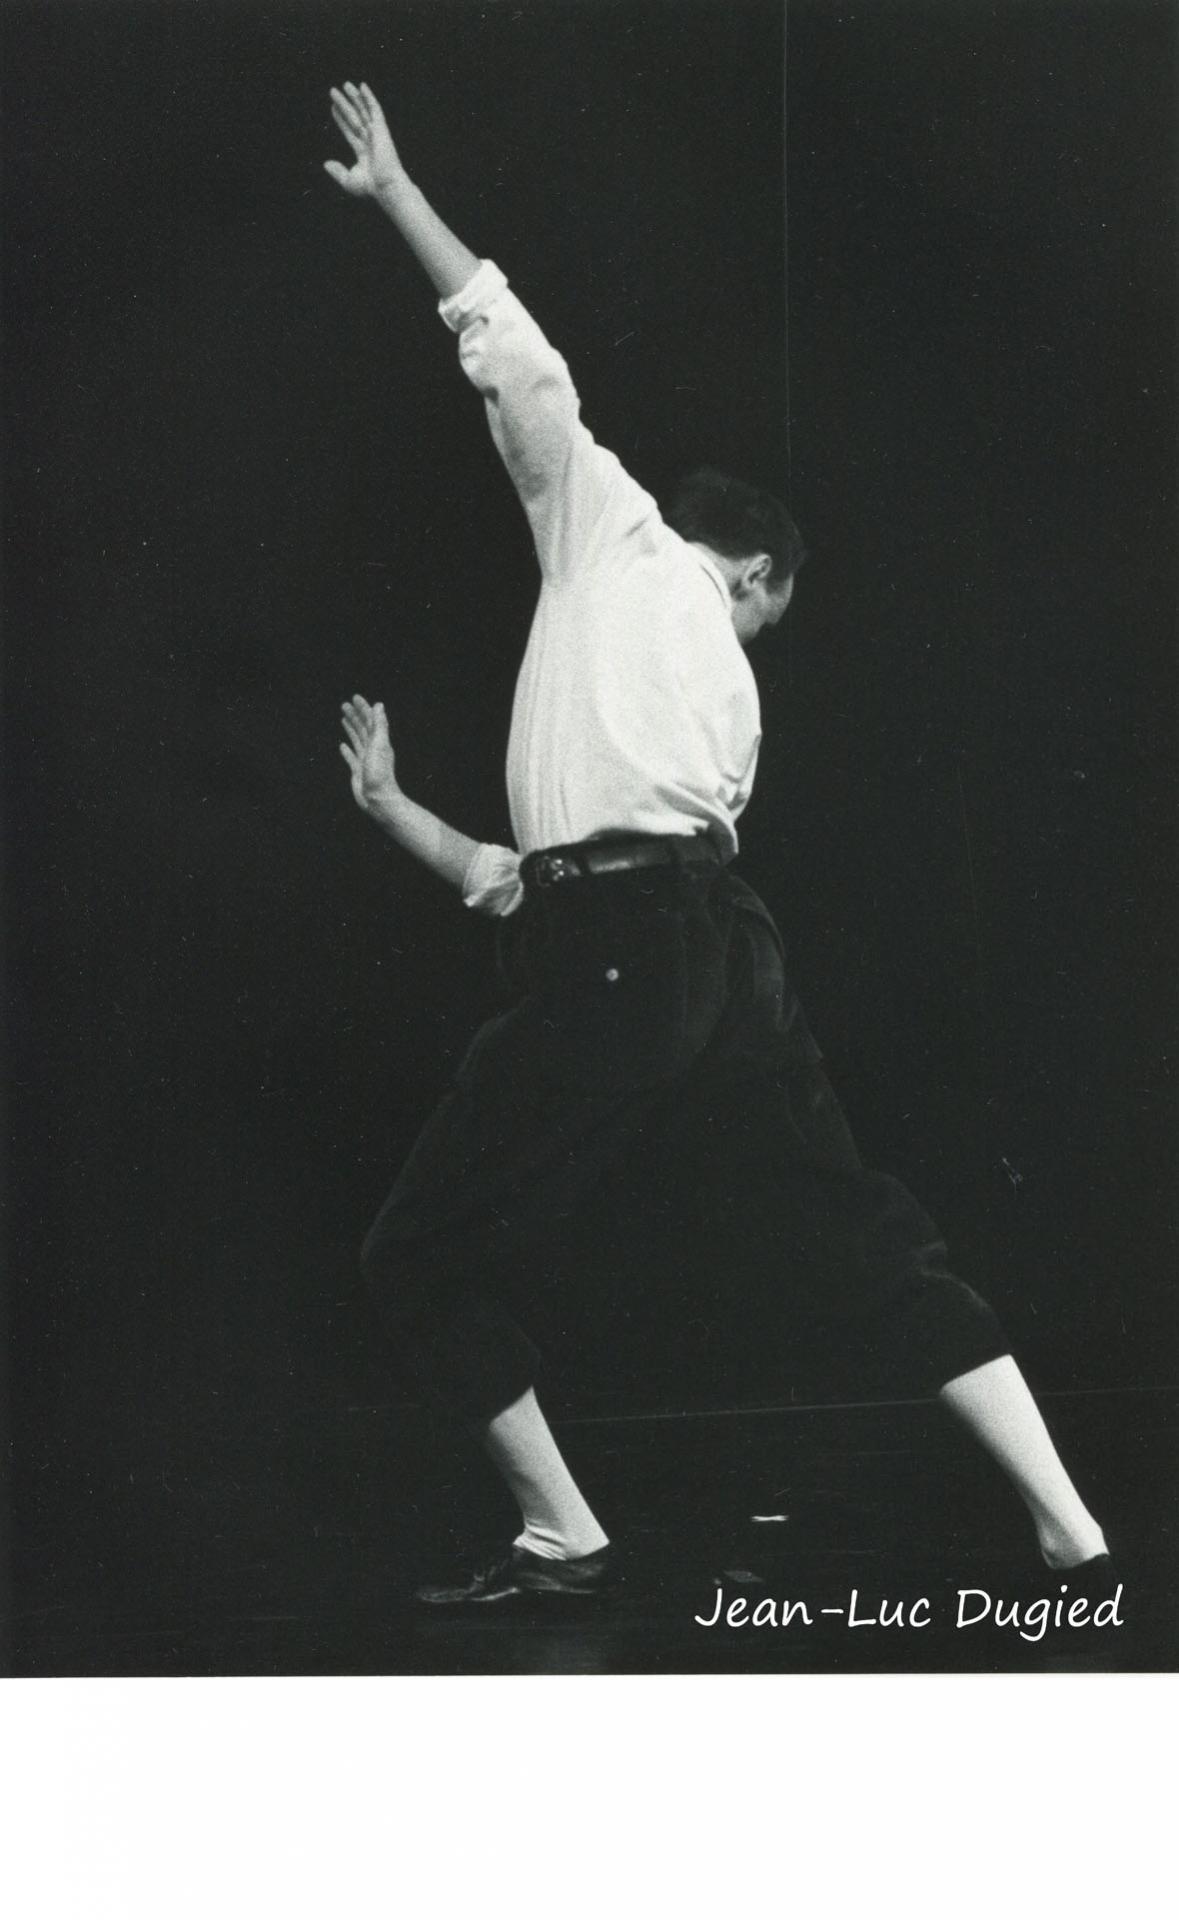 32 Dugied Fabrice - le retour de T - 1988